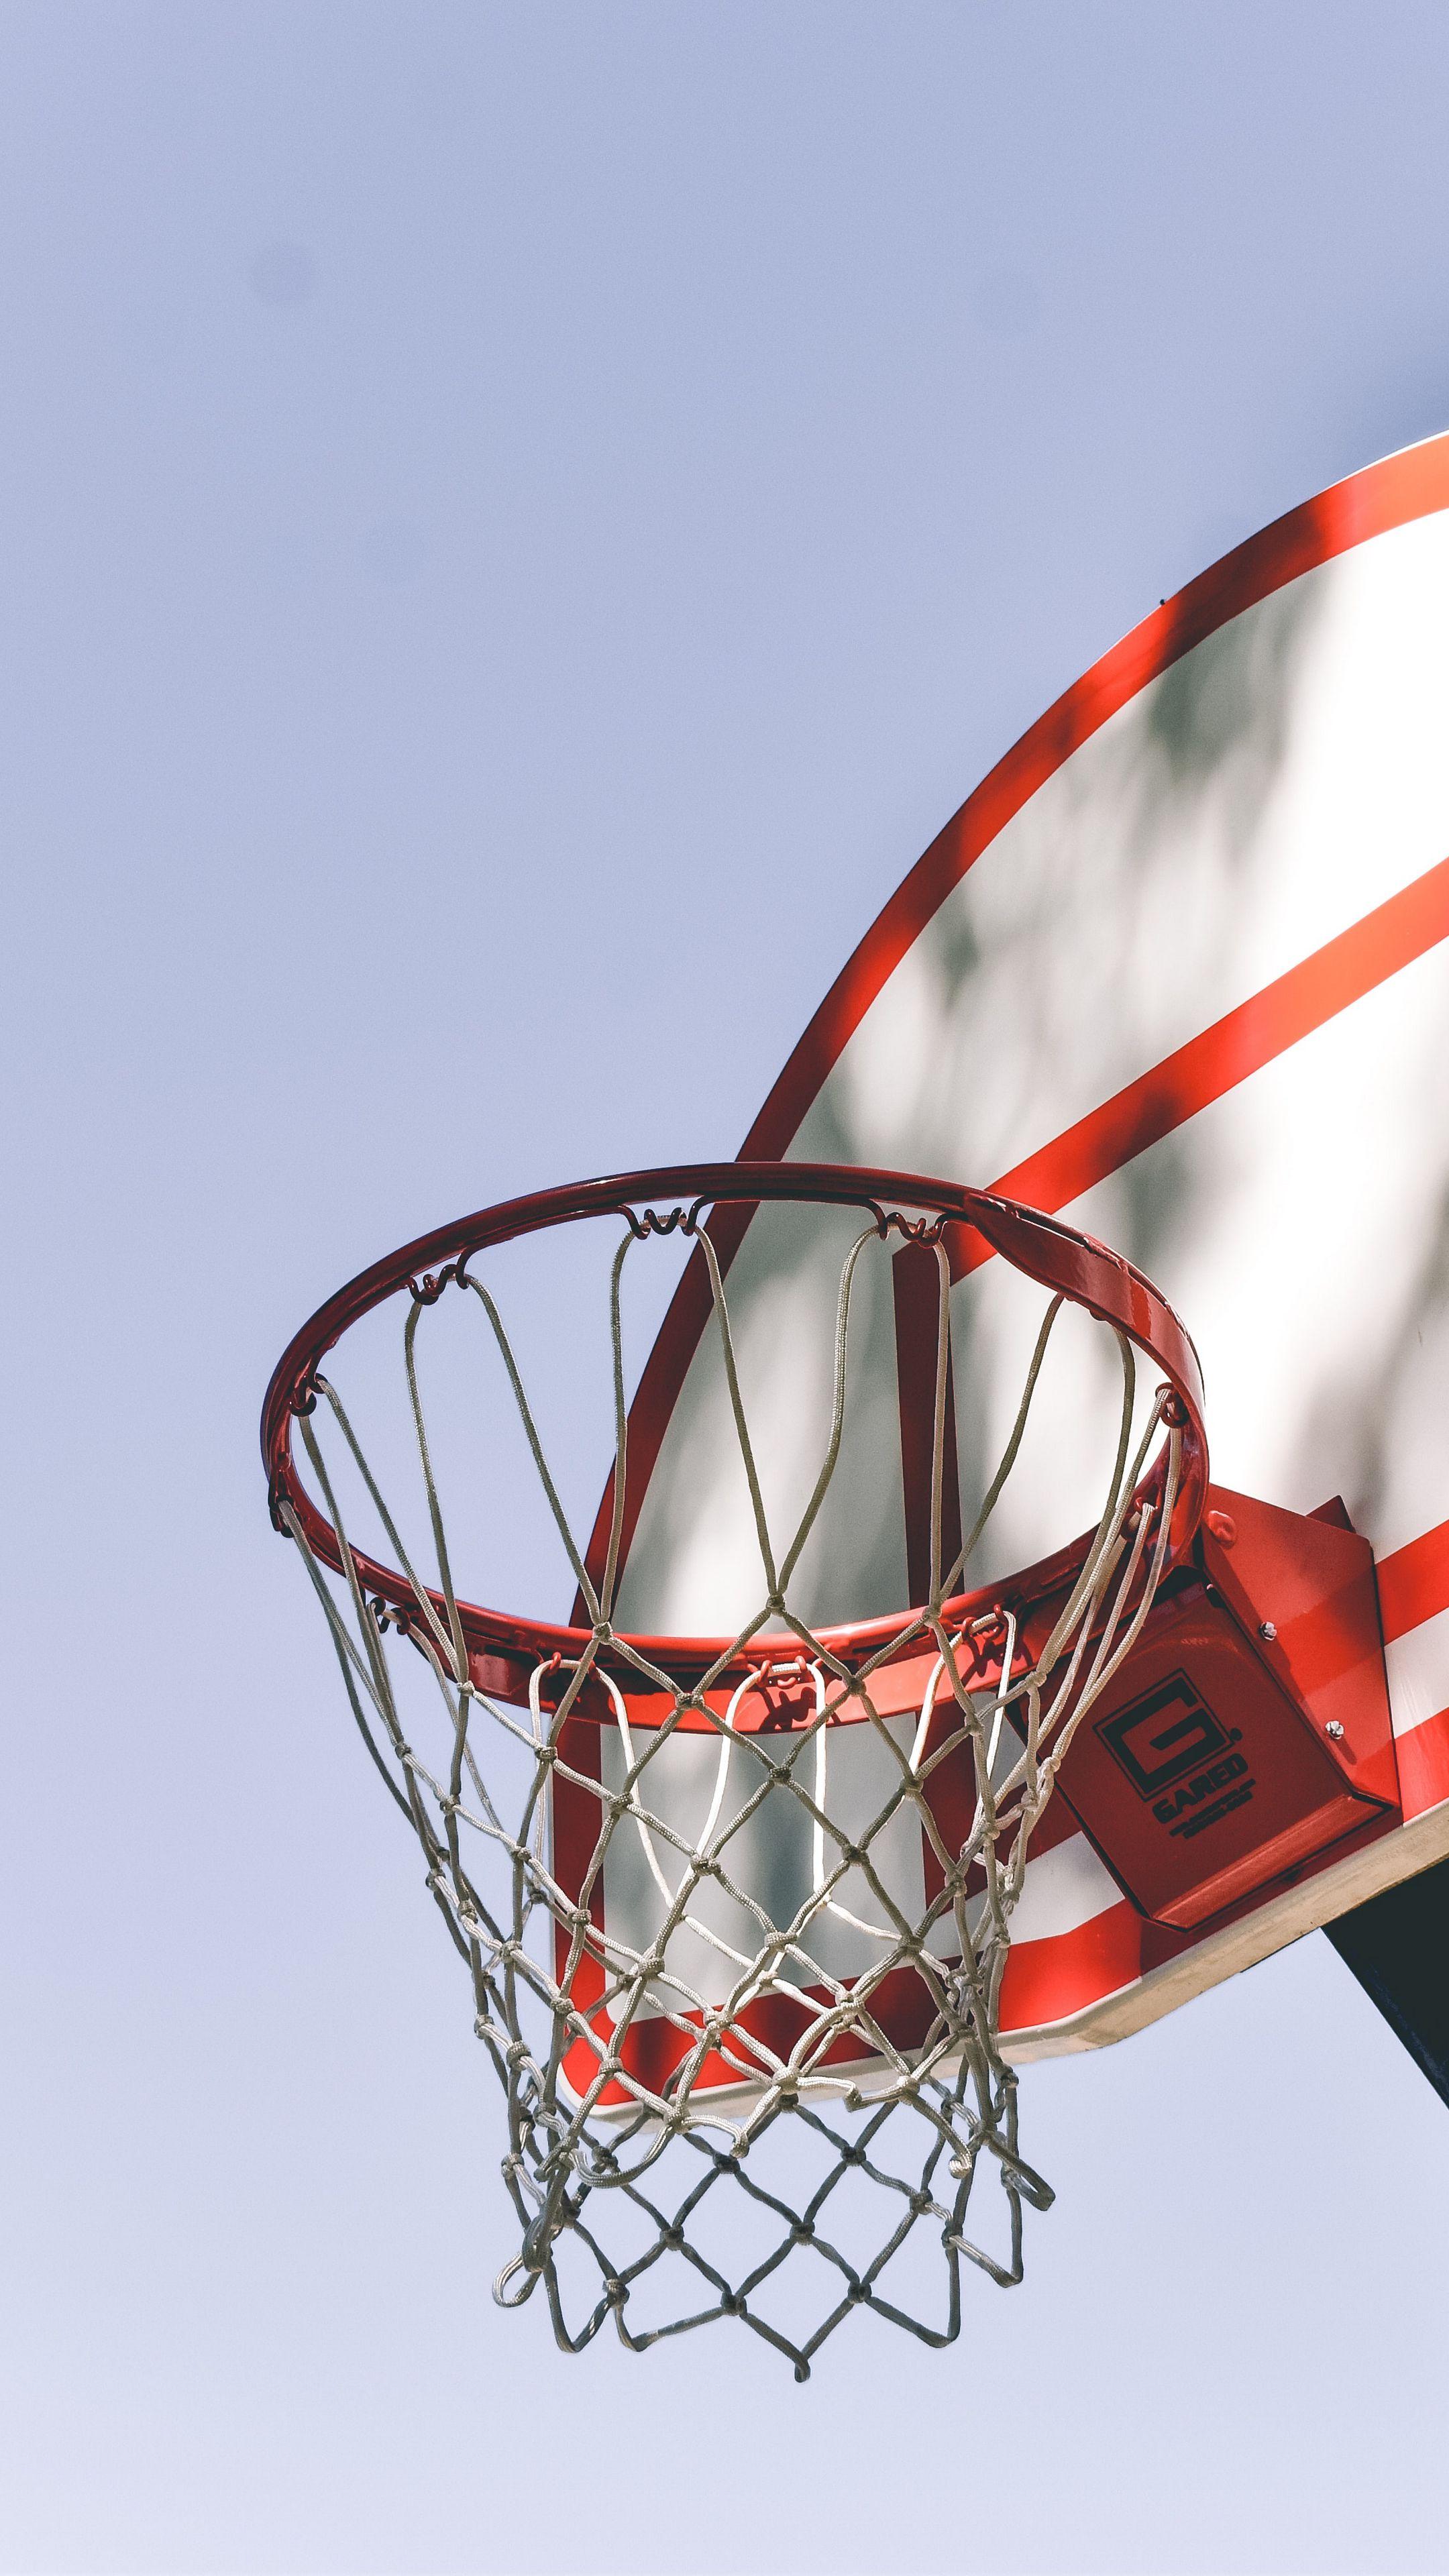 2160x3840 Wallpaper basketball, basketball net, basketball hoop, backboard, metal